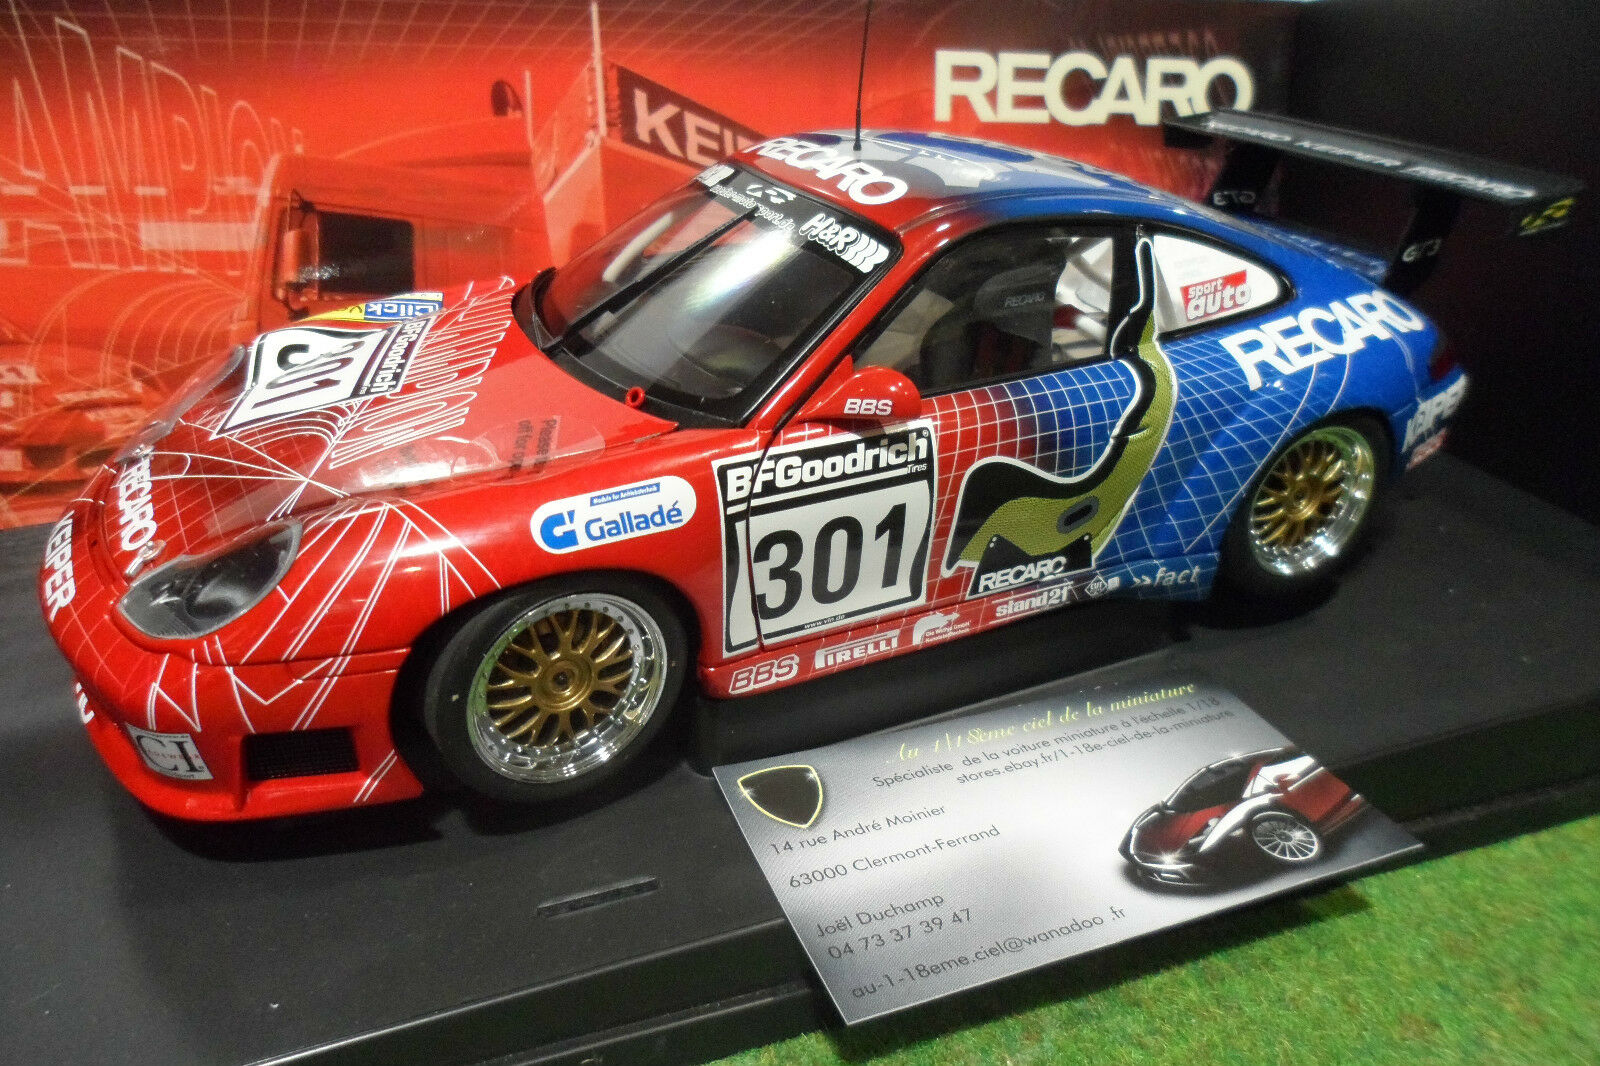 PORSCHE 911 996 GT3 RS  301 RECARO 1 18 AUTOart CI-IMAGEWEAR voiture miniature